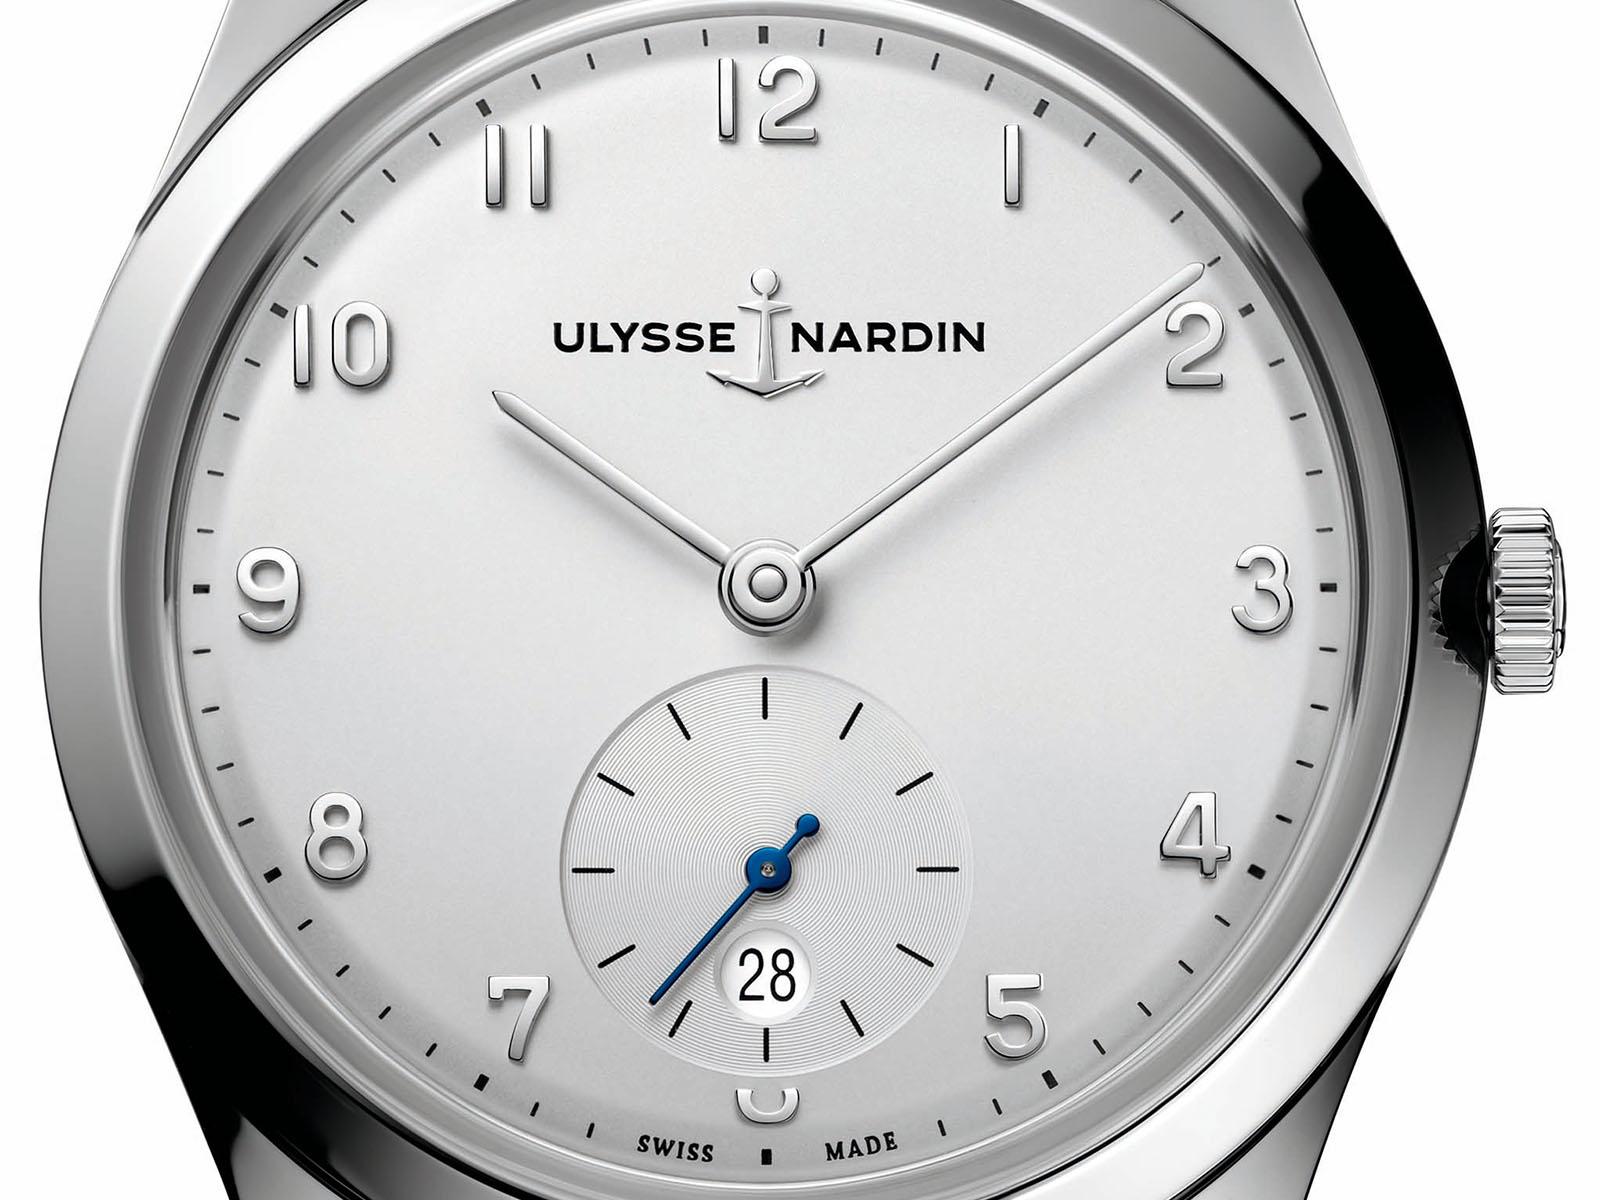 Ulysse-Nardin-Classico-Paul-David-Nardin-2.jpg